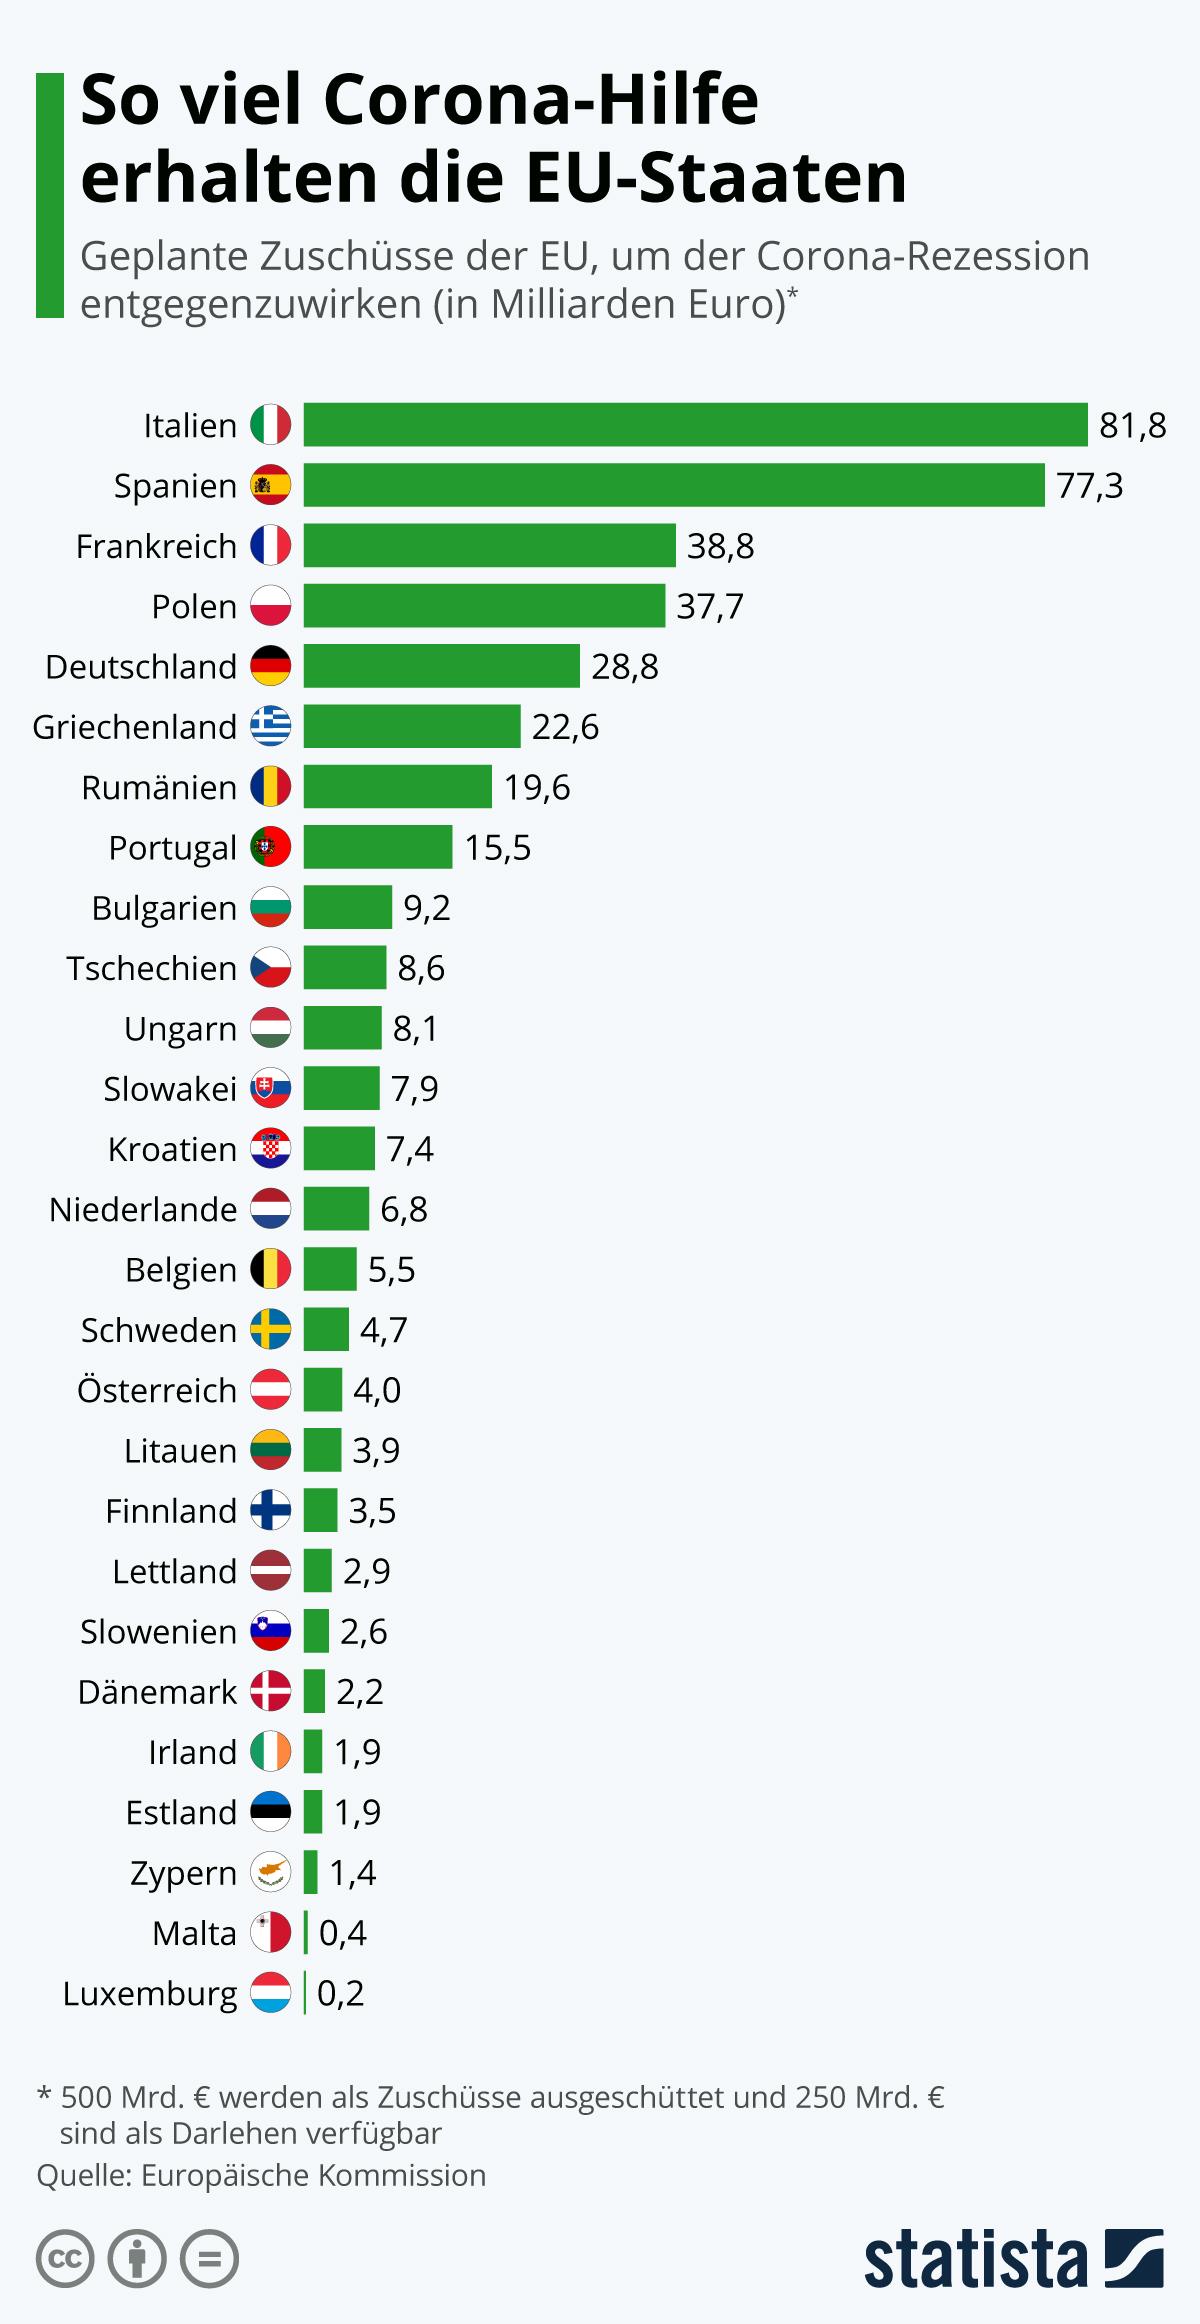 Infografik: So viel Corona-Hilfe erhalten die EU-Staaten | Statista